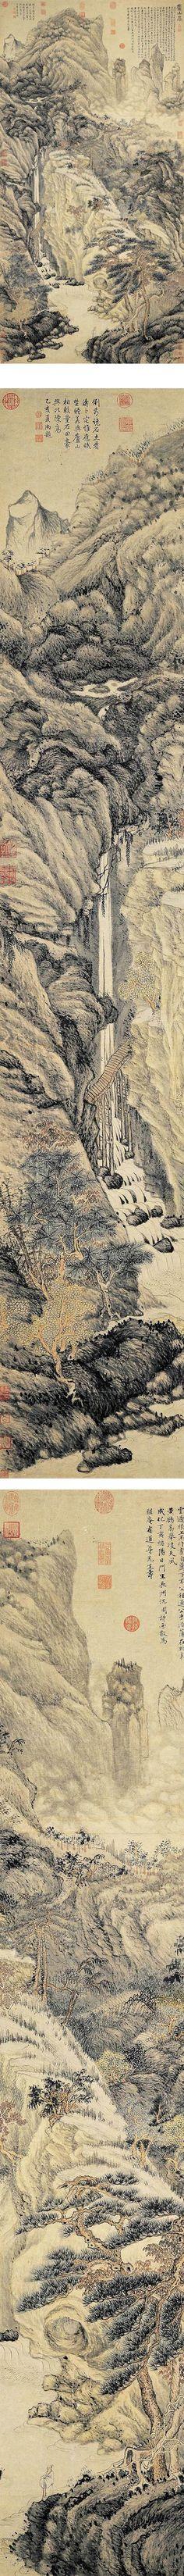 Lofty Mount Lu by Shen Zhou (Chinese, 1427–1509) Period: Ming dynasty